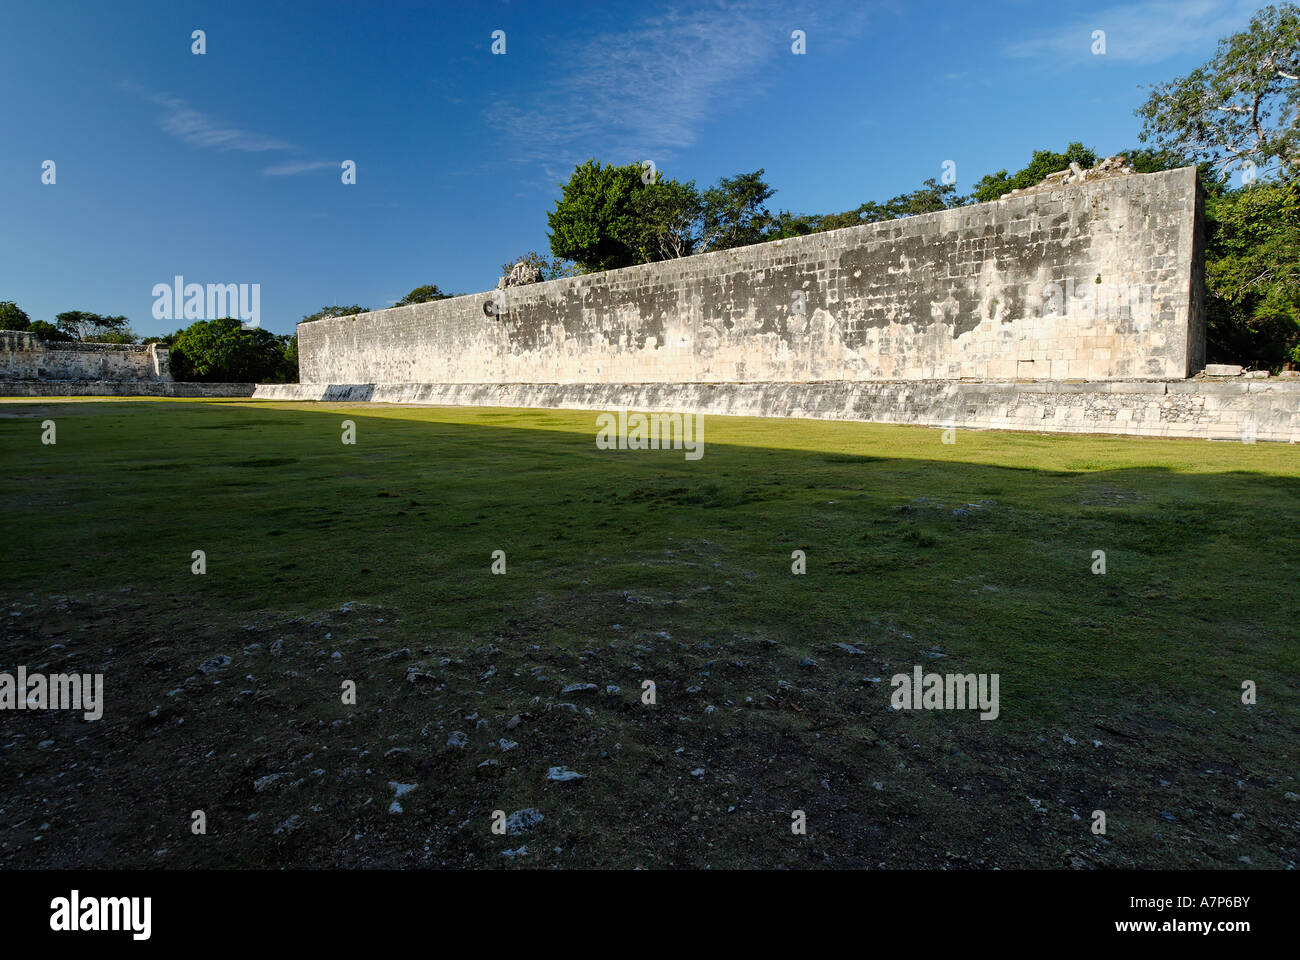 Juego de Pelota ball court Maya and Toltek archeological site Chichen Itza Yucatan Mexico - Stock Image